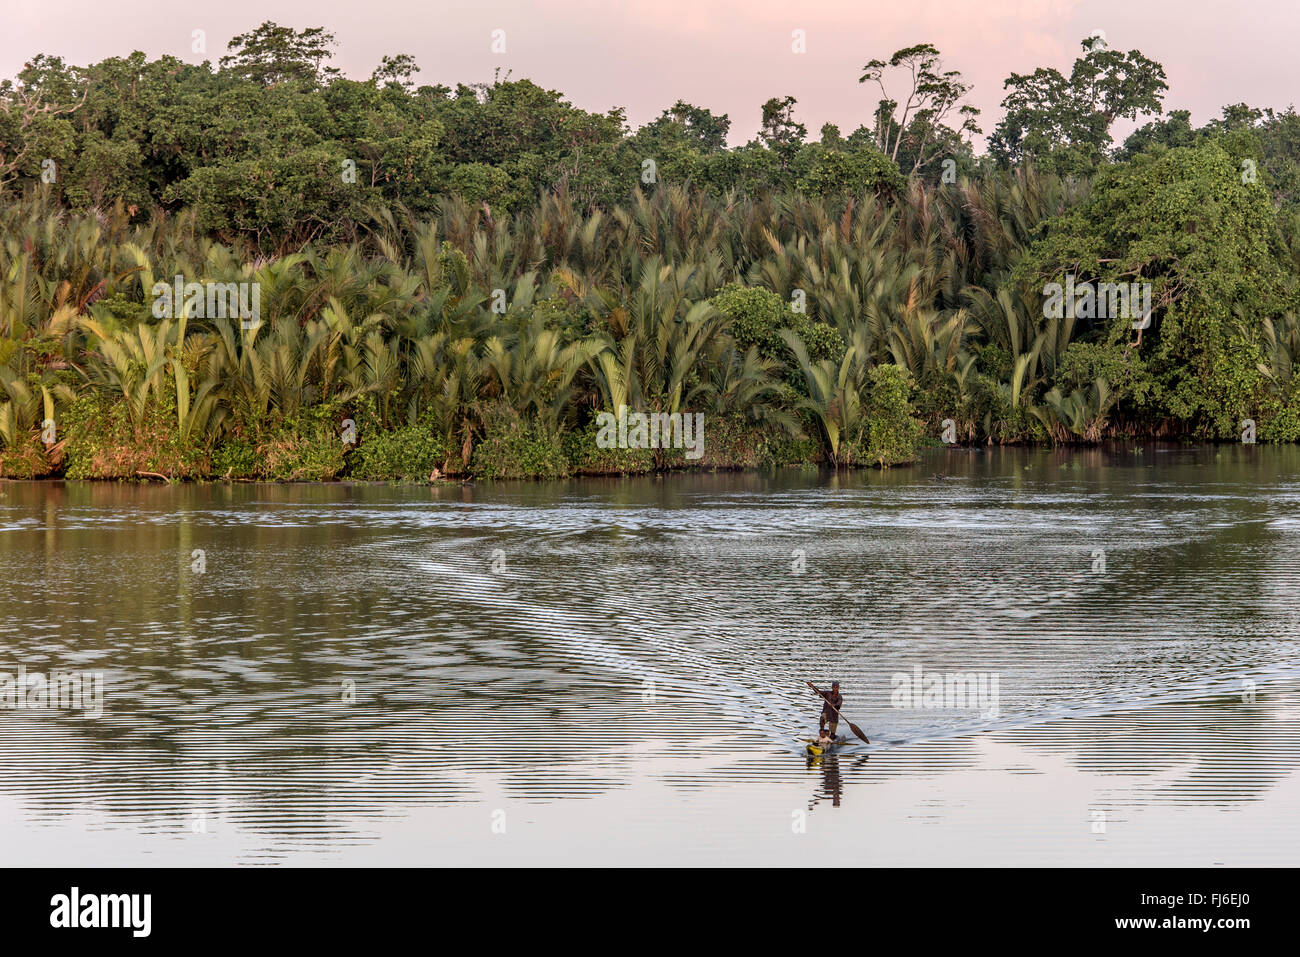 Local Man paddling on canoe Sepik River, Papua New Guinea - Stock Image